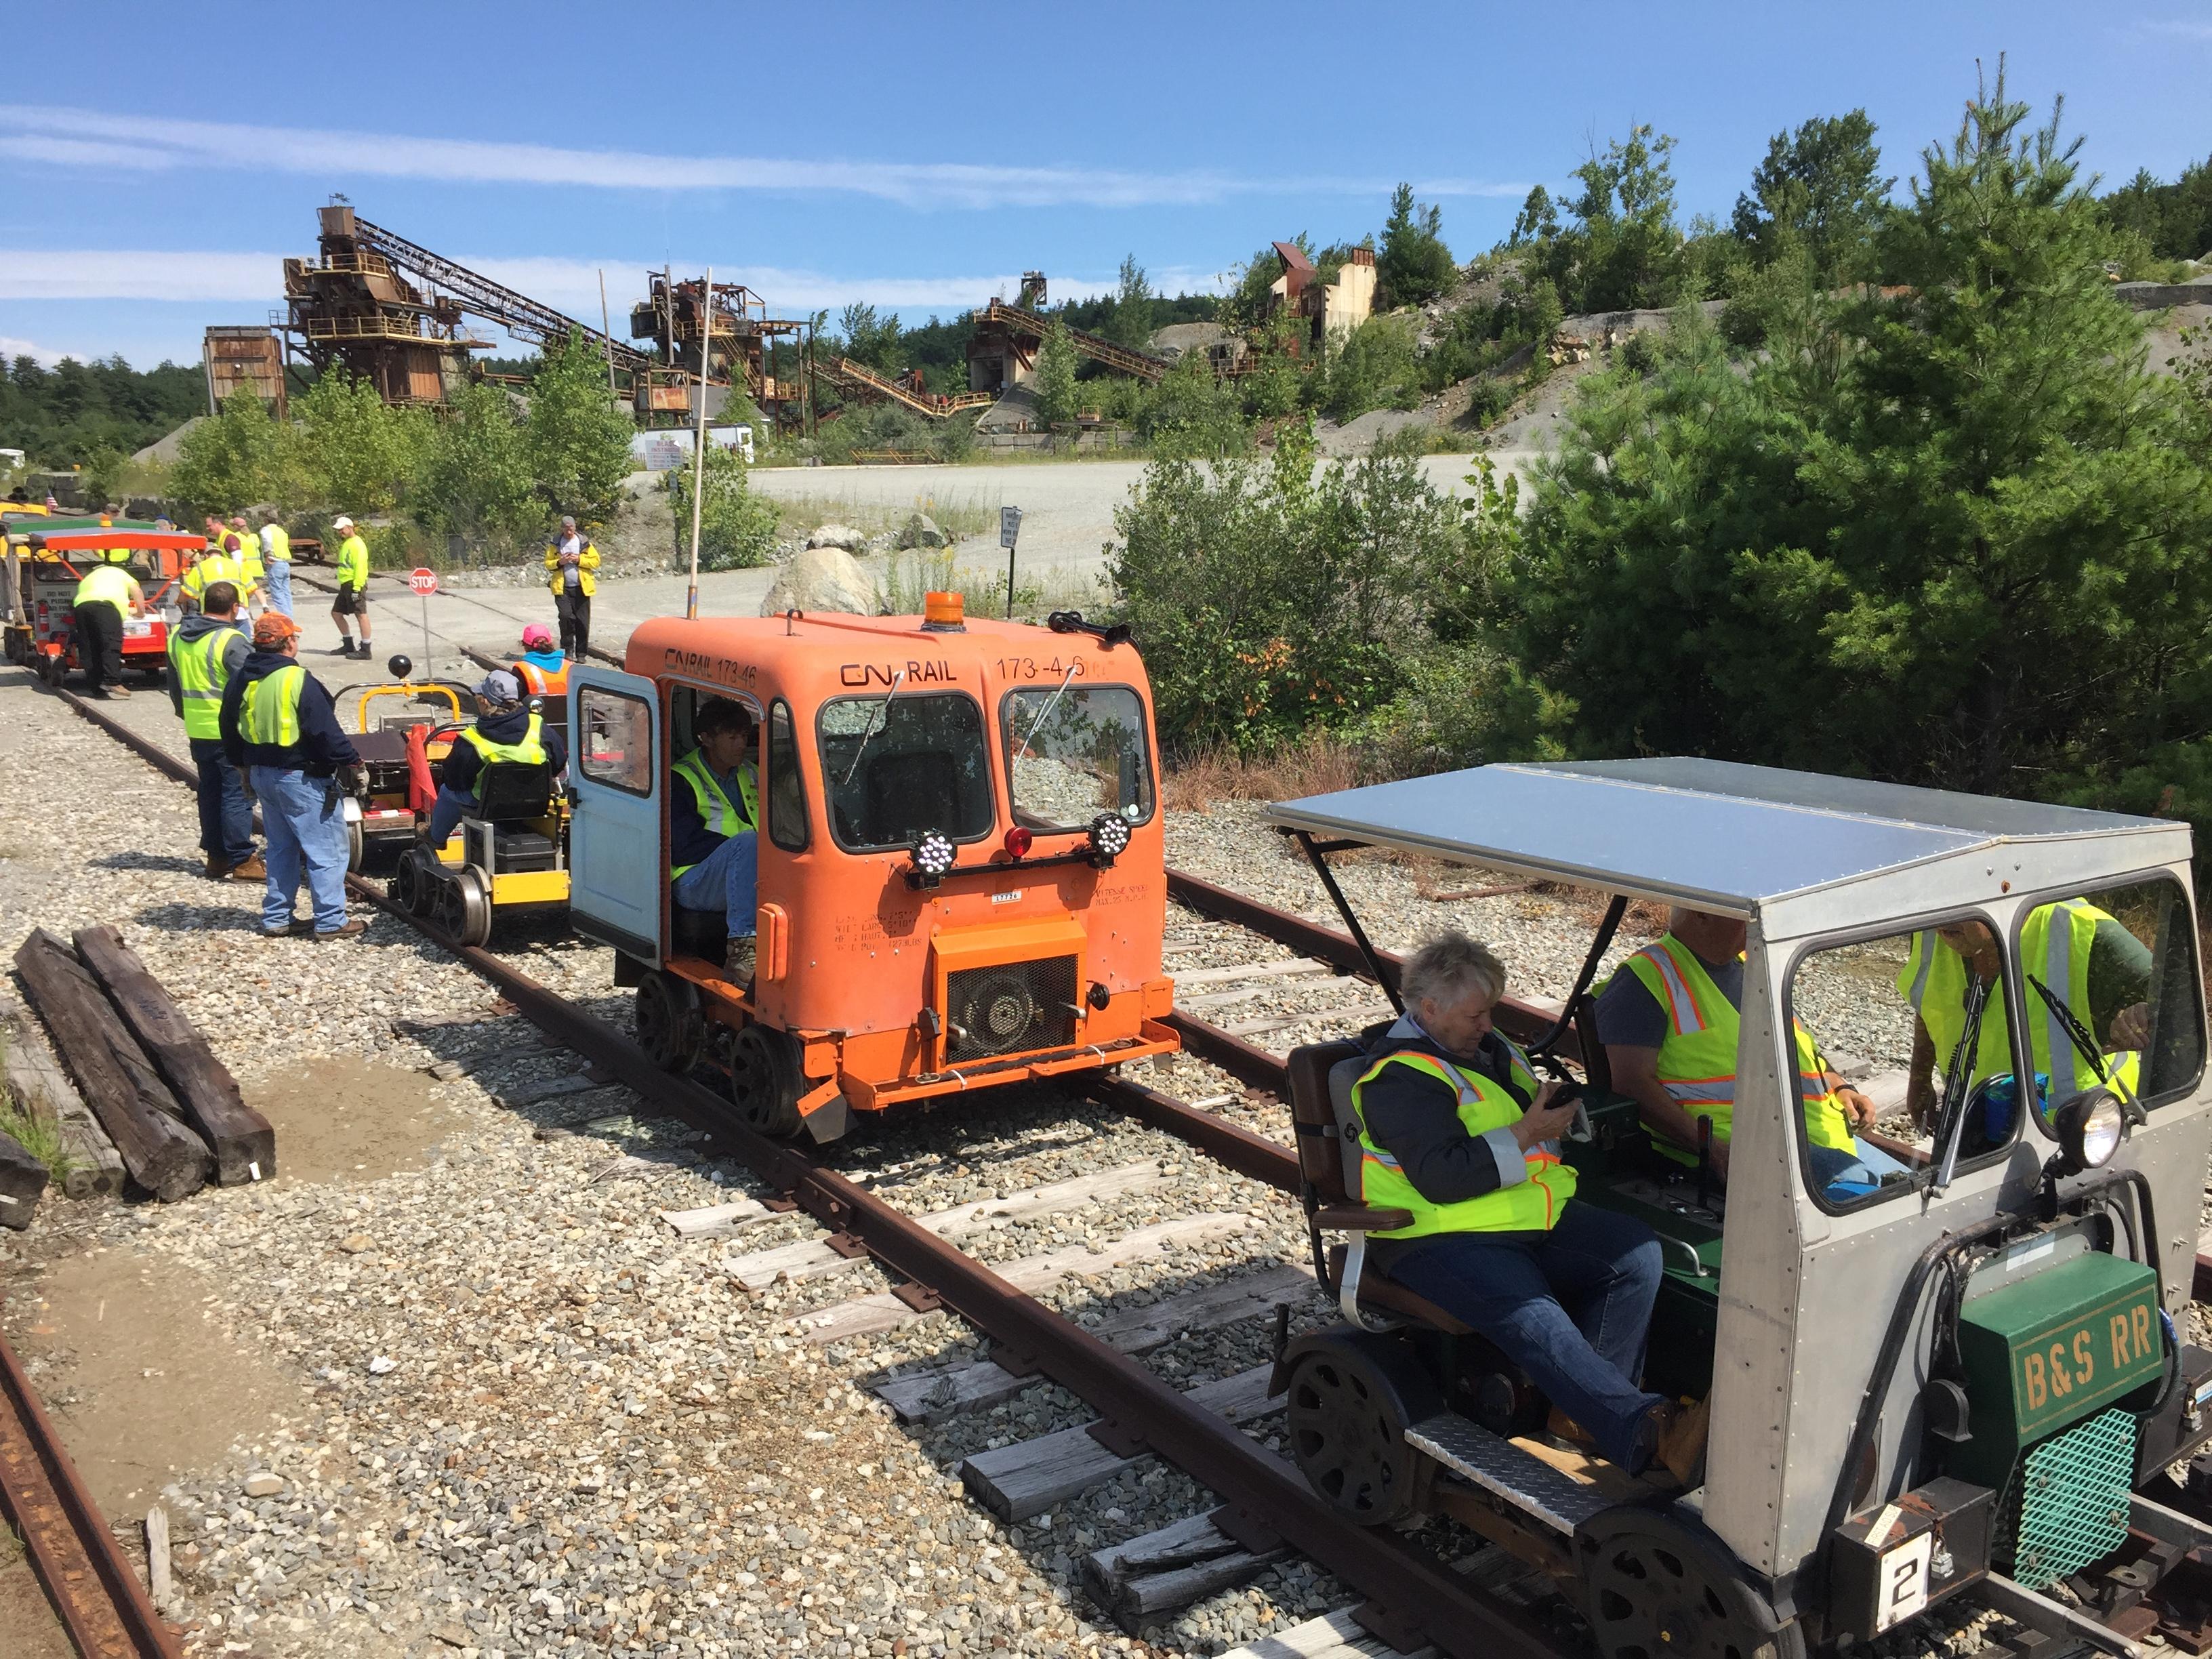 cotton valley rail trail club cvrtc home page